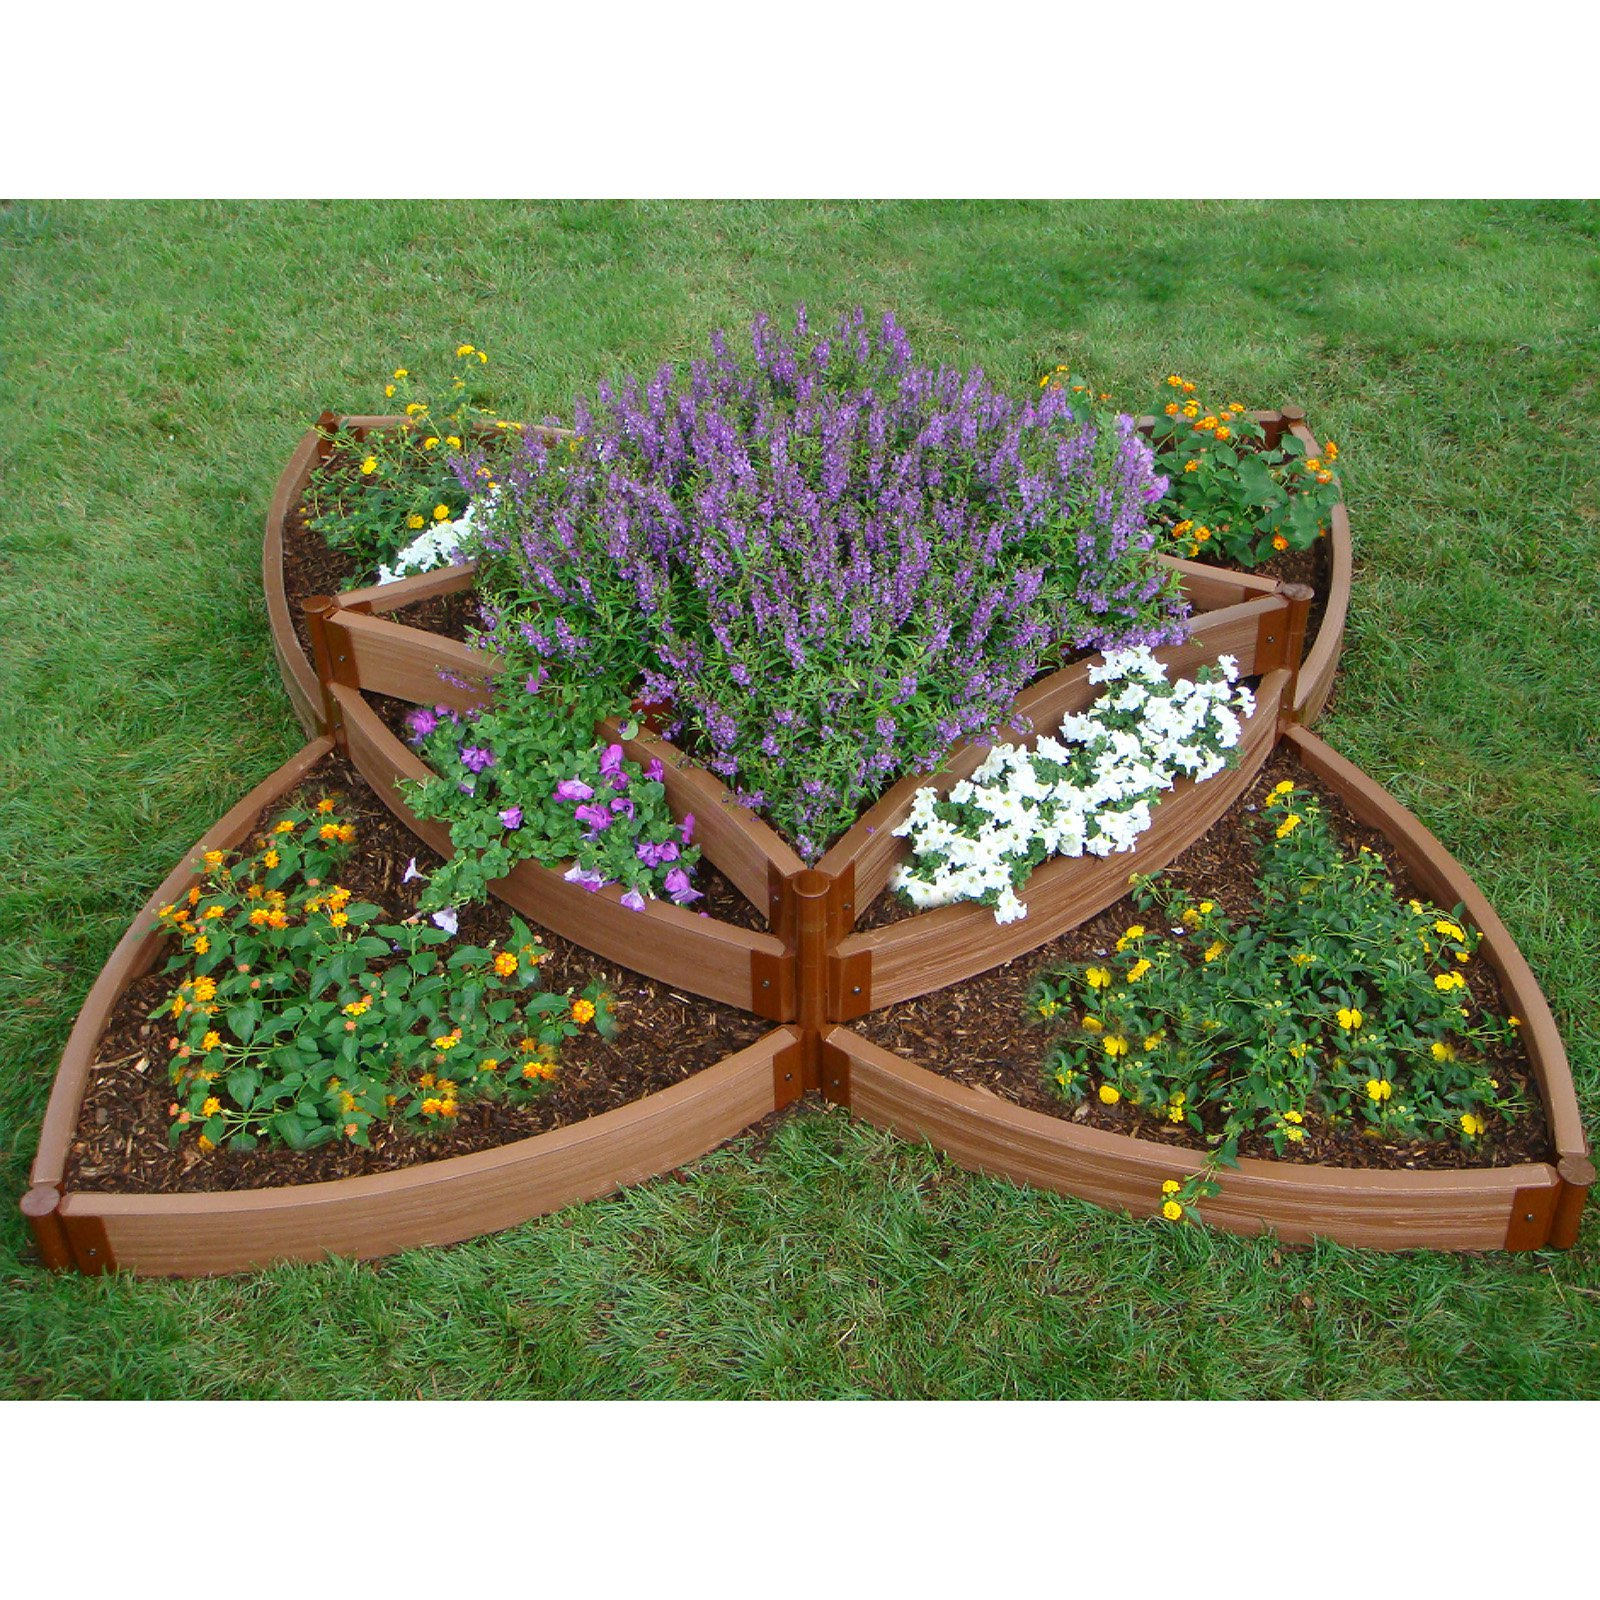 Frame It All 1-inch Series Composite Versailles Sunburst Raised Garden Bed Kit - 96L x 96W x 16.5H in.